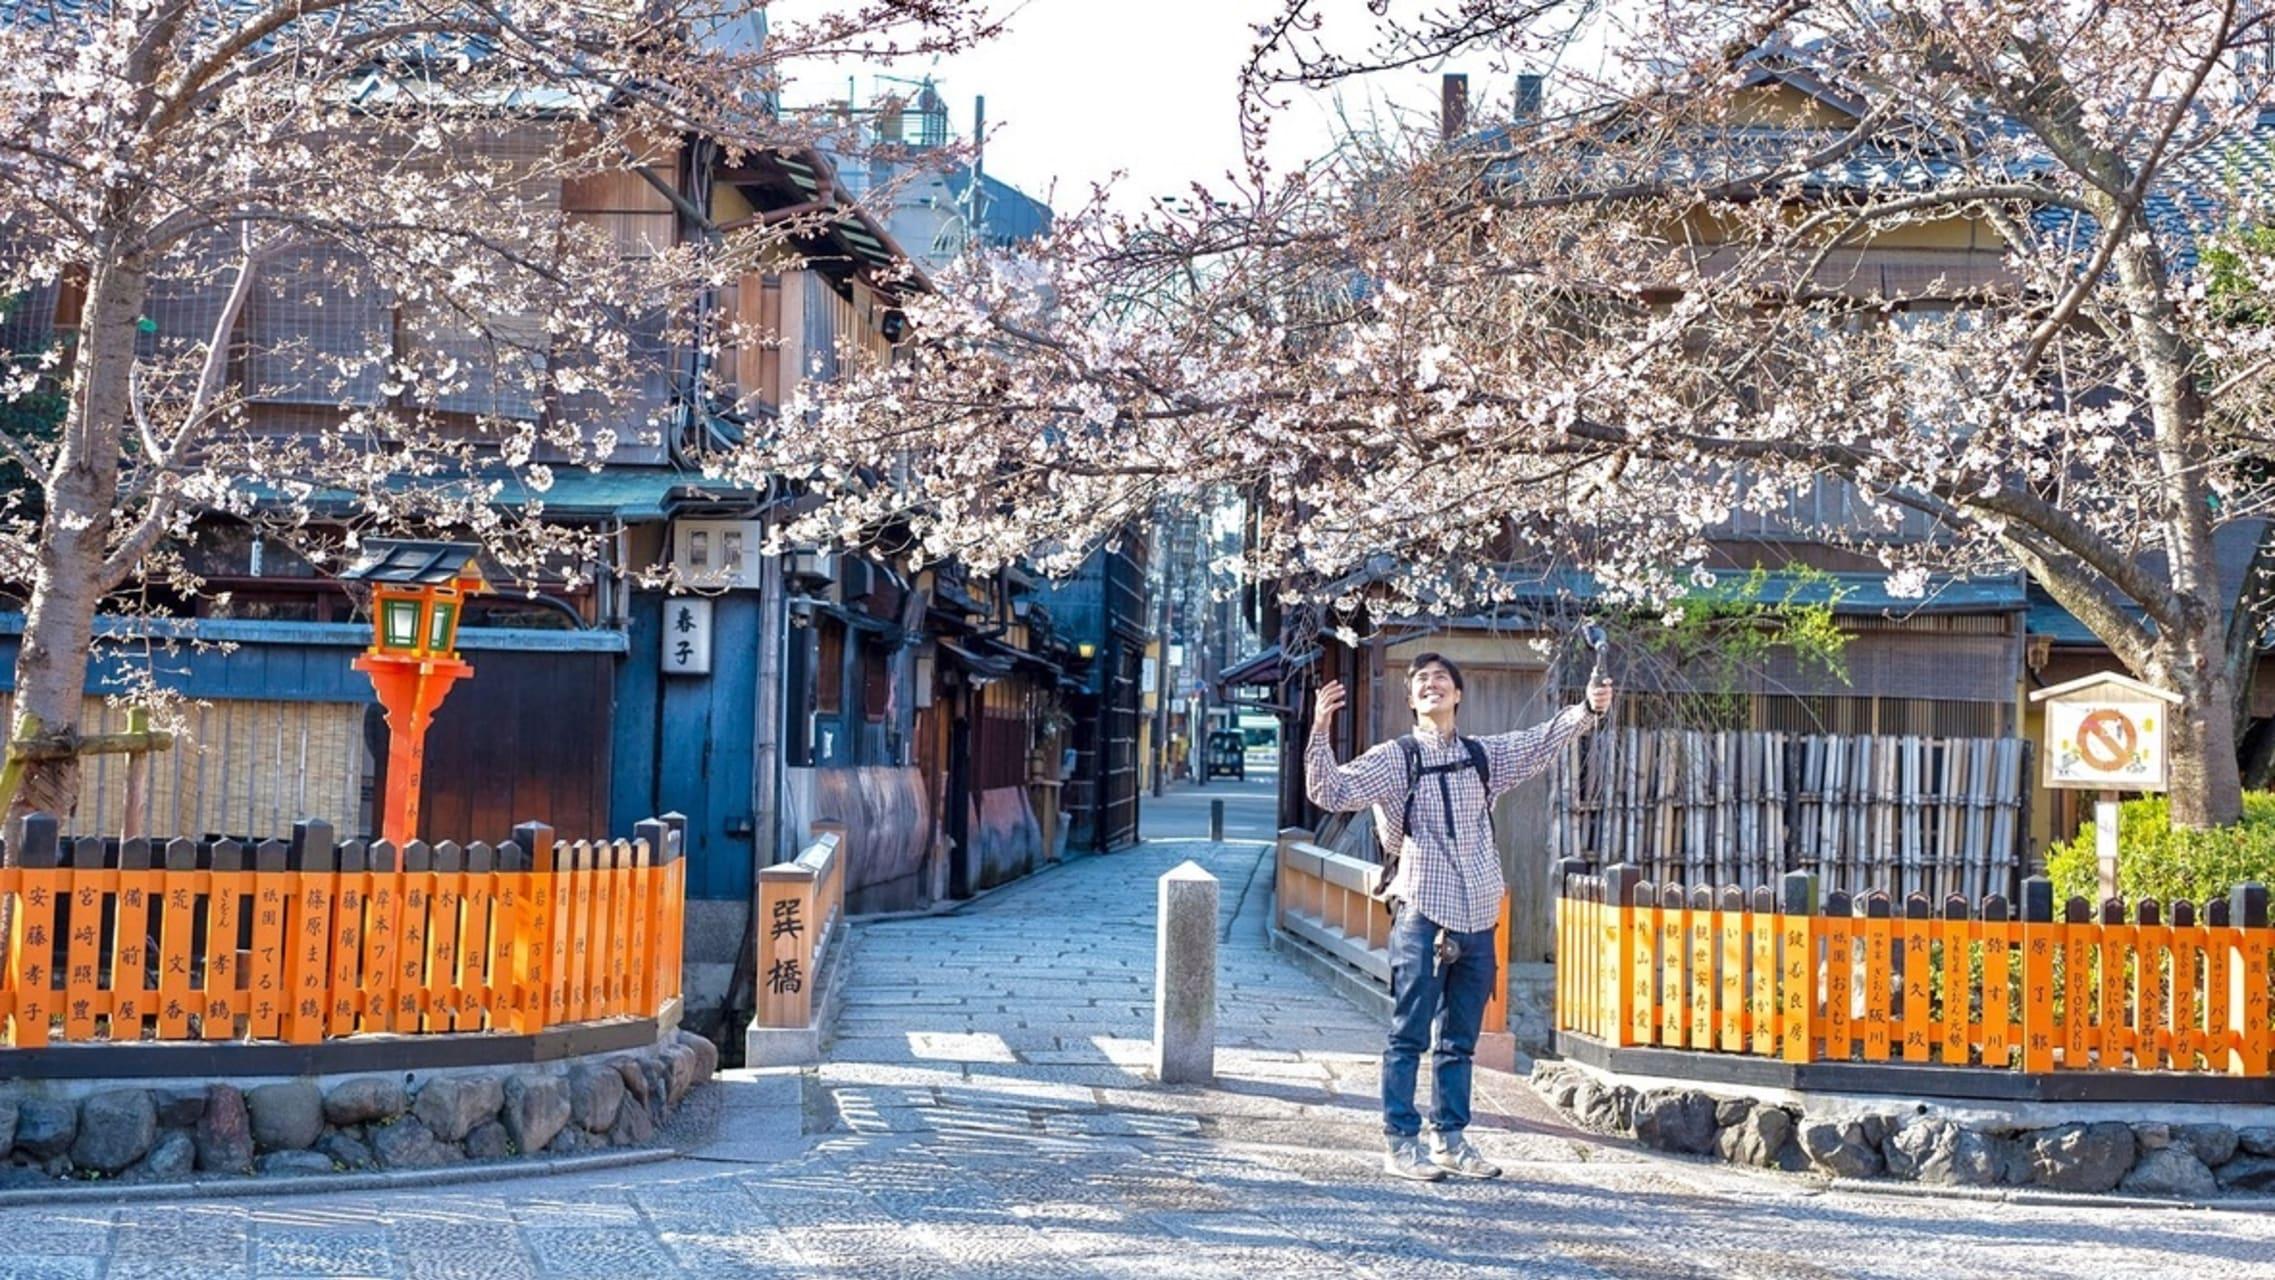 Kyoto - Explore Gion, Kyoto's Geisha district